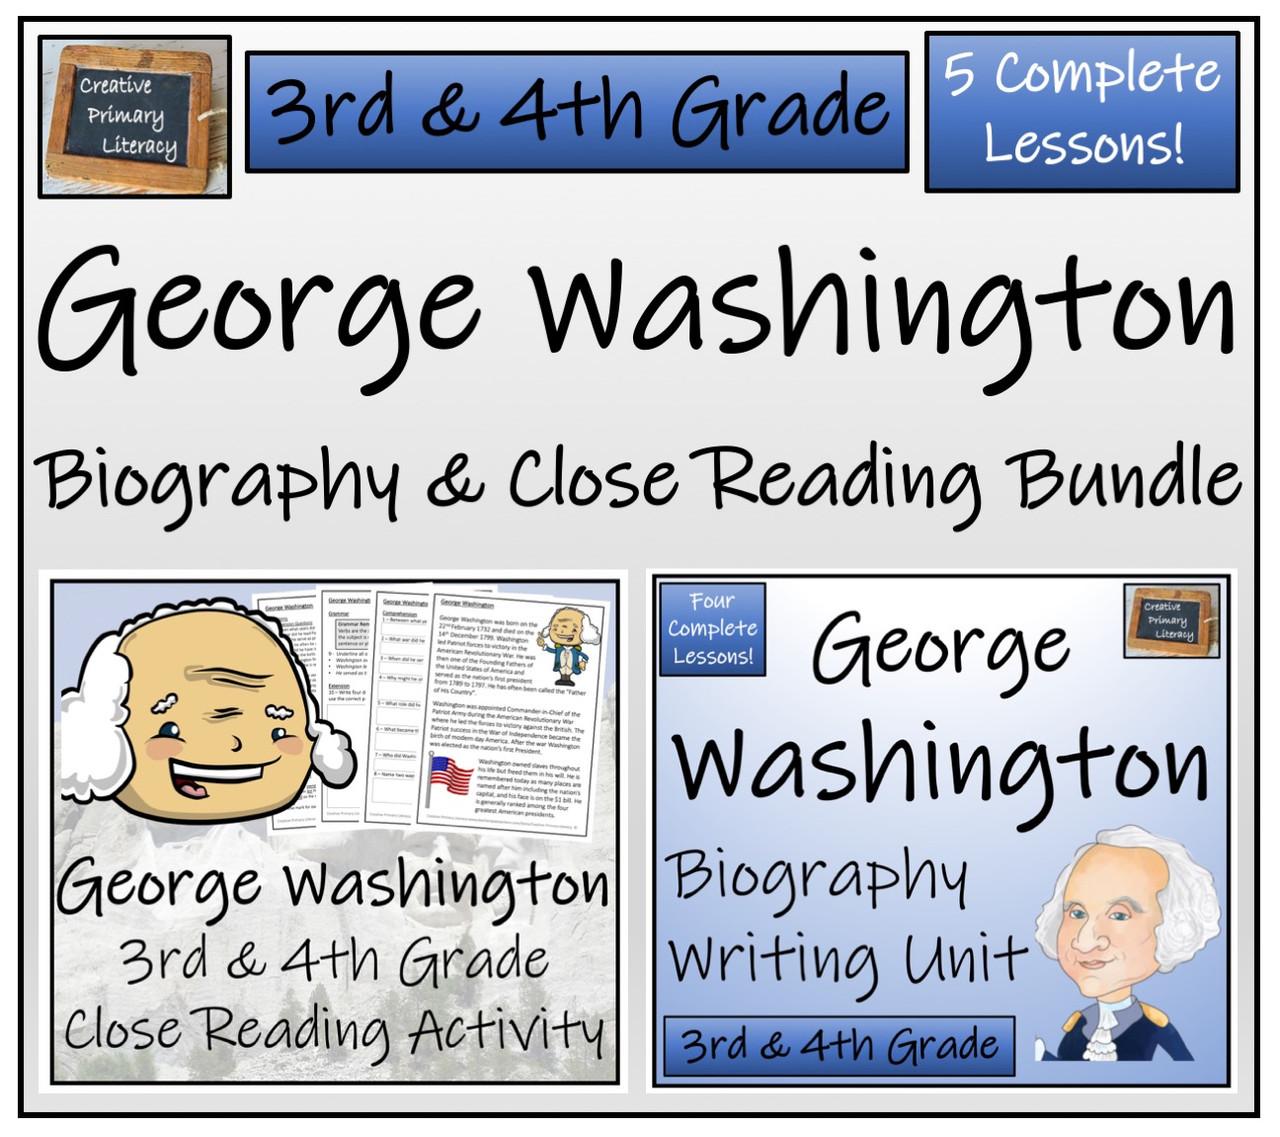 medium resolution of George Washington - 3rd \u0026 4th Grade Close Read \u0026 Biography Writing Bundle -  Amped Up Learning